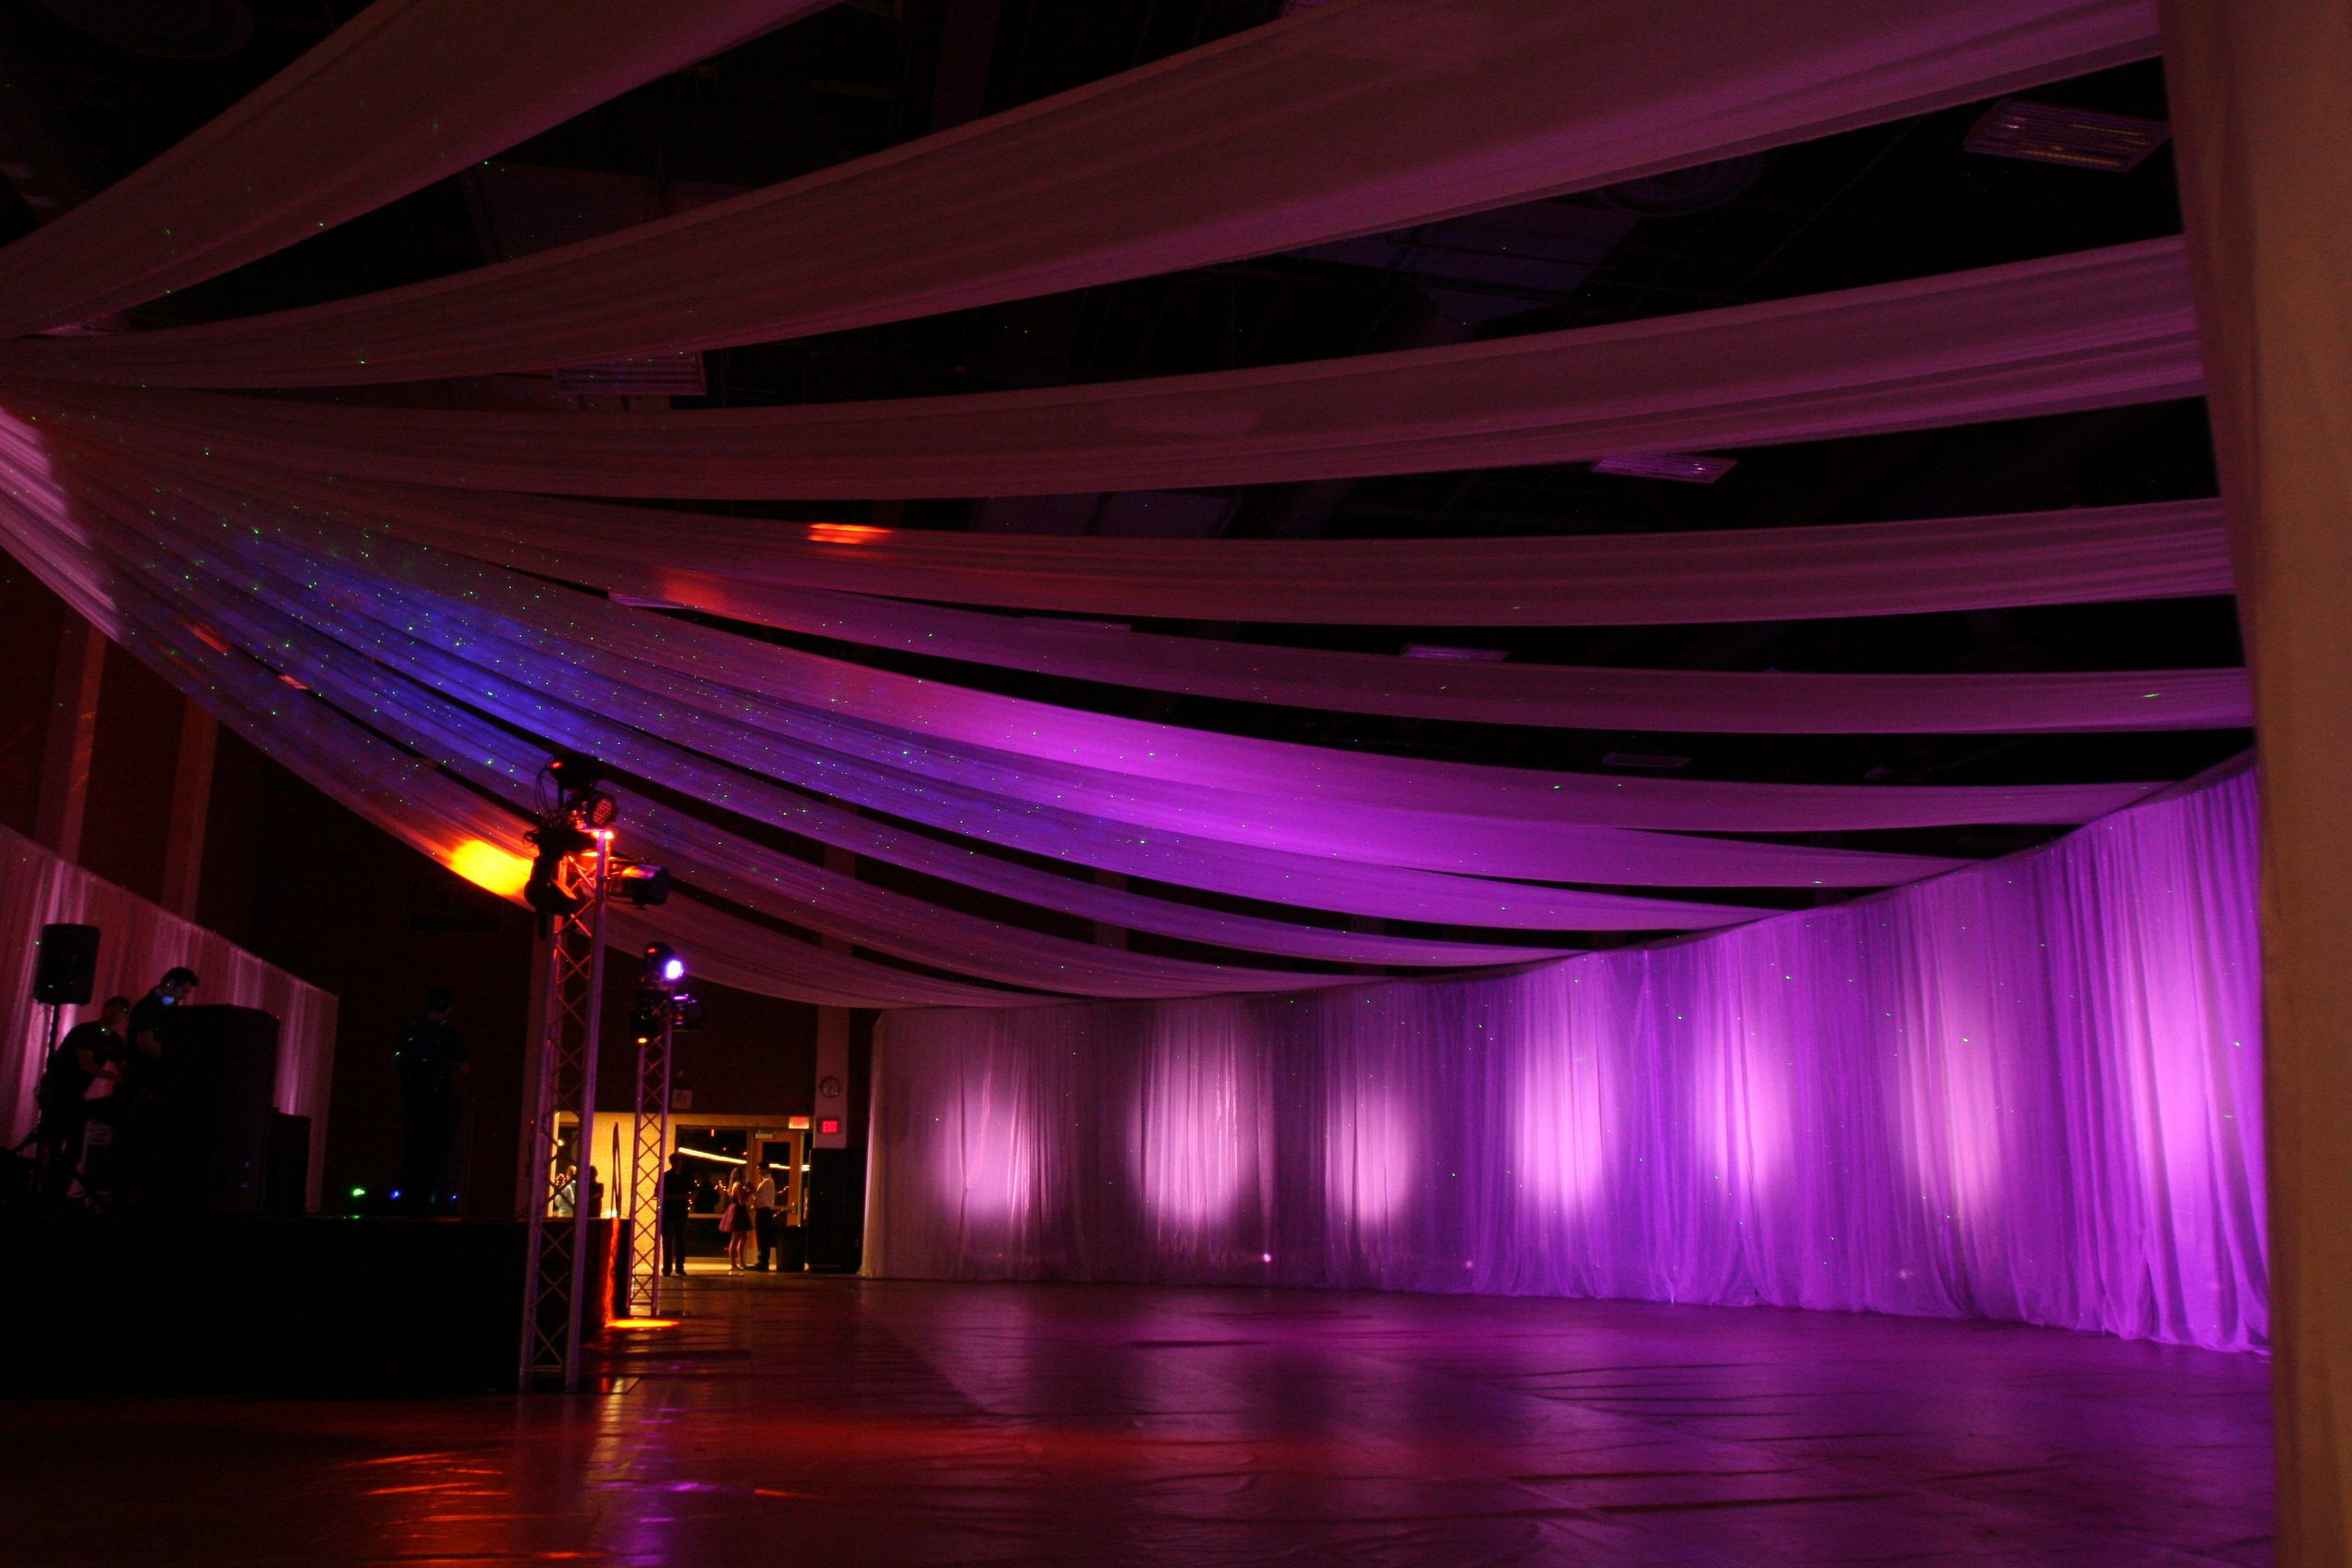 decorating timmins drape and events elegant drapes pipe draping photo